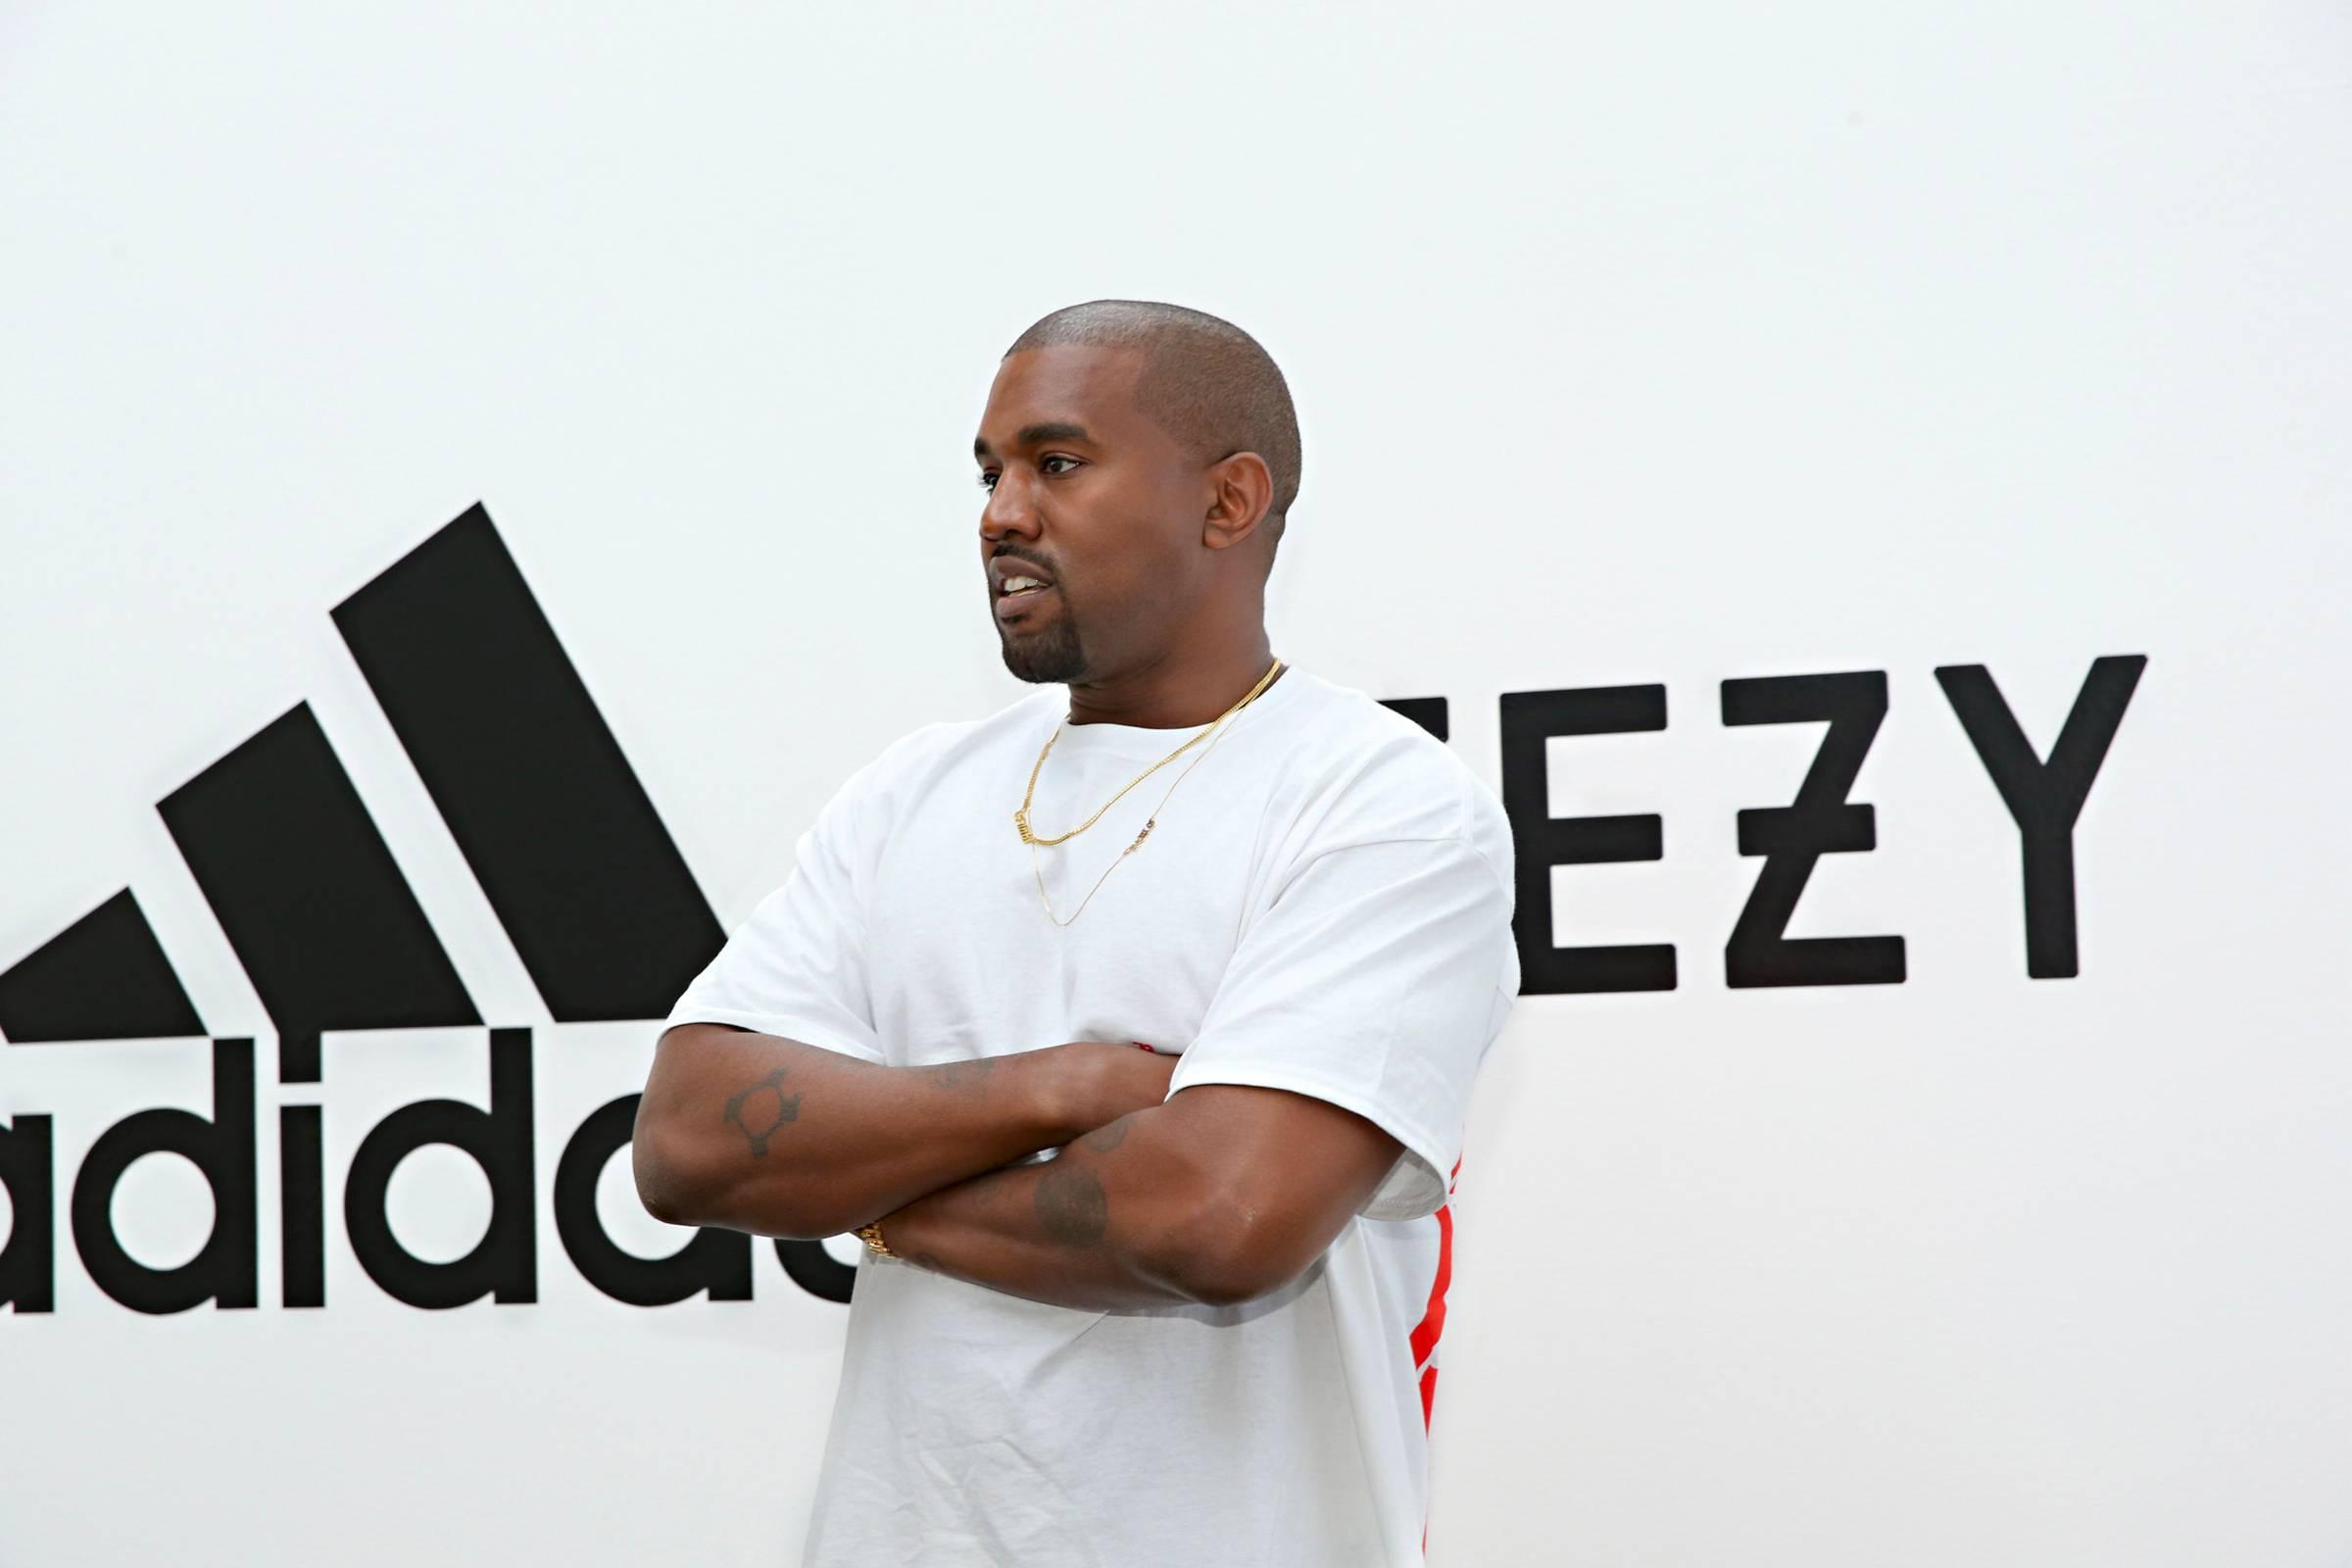 History of Kanye West x adidas (2015-Present)